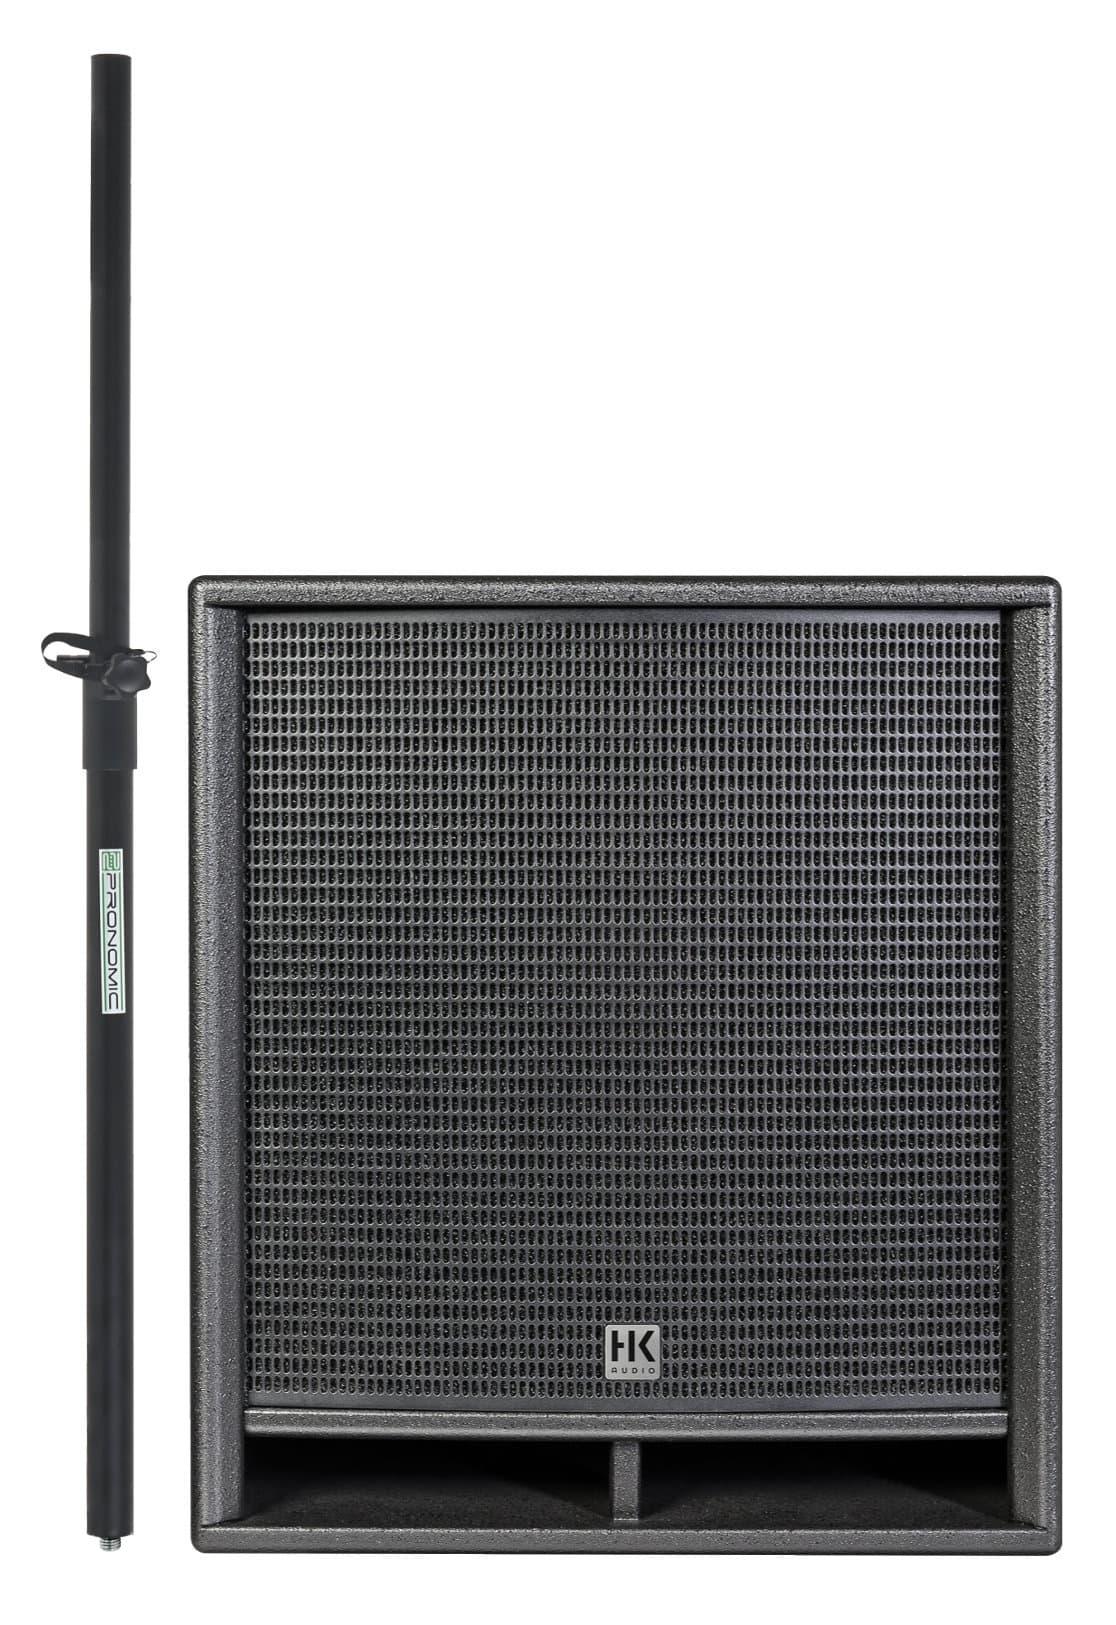 Pasubwoofer - HK Audio PR O 118 SUB D2 Set inkl. Distanzstange - Onlineshop Musikhaus Kirstein